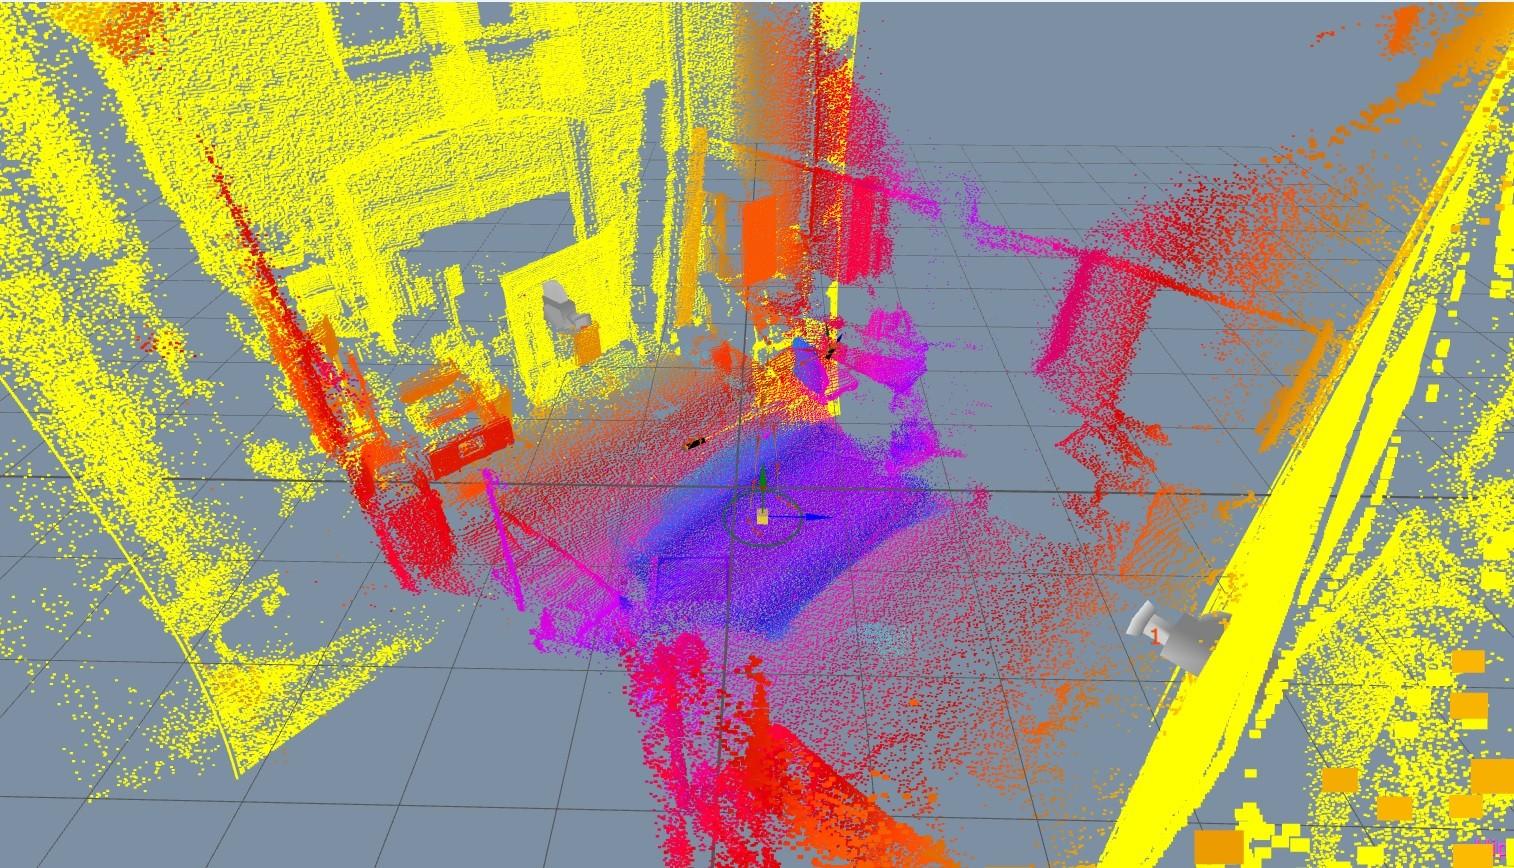 ArtStation - Low Budget Motion Capture Pipeline, Alex Shaw